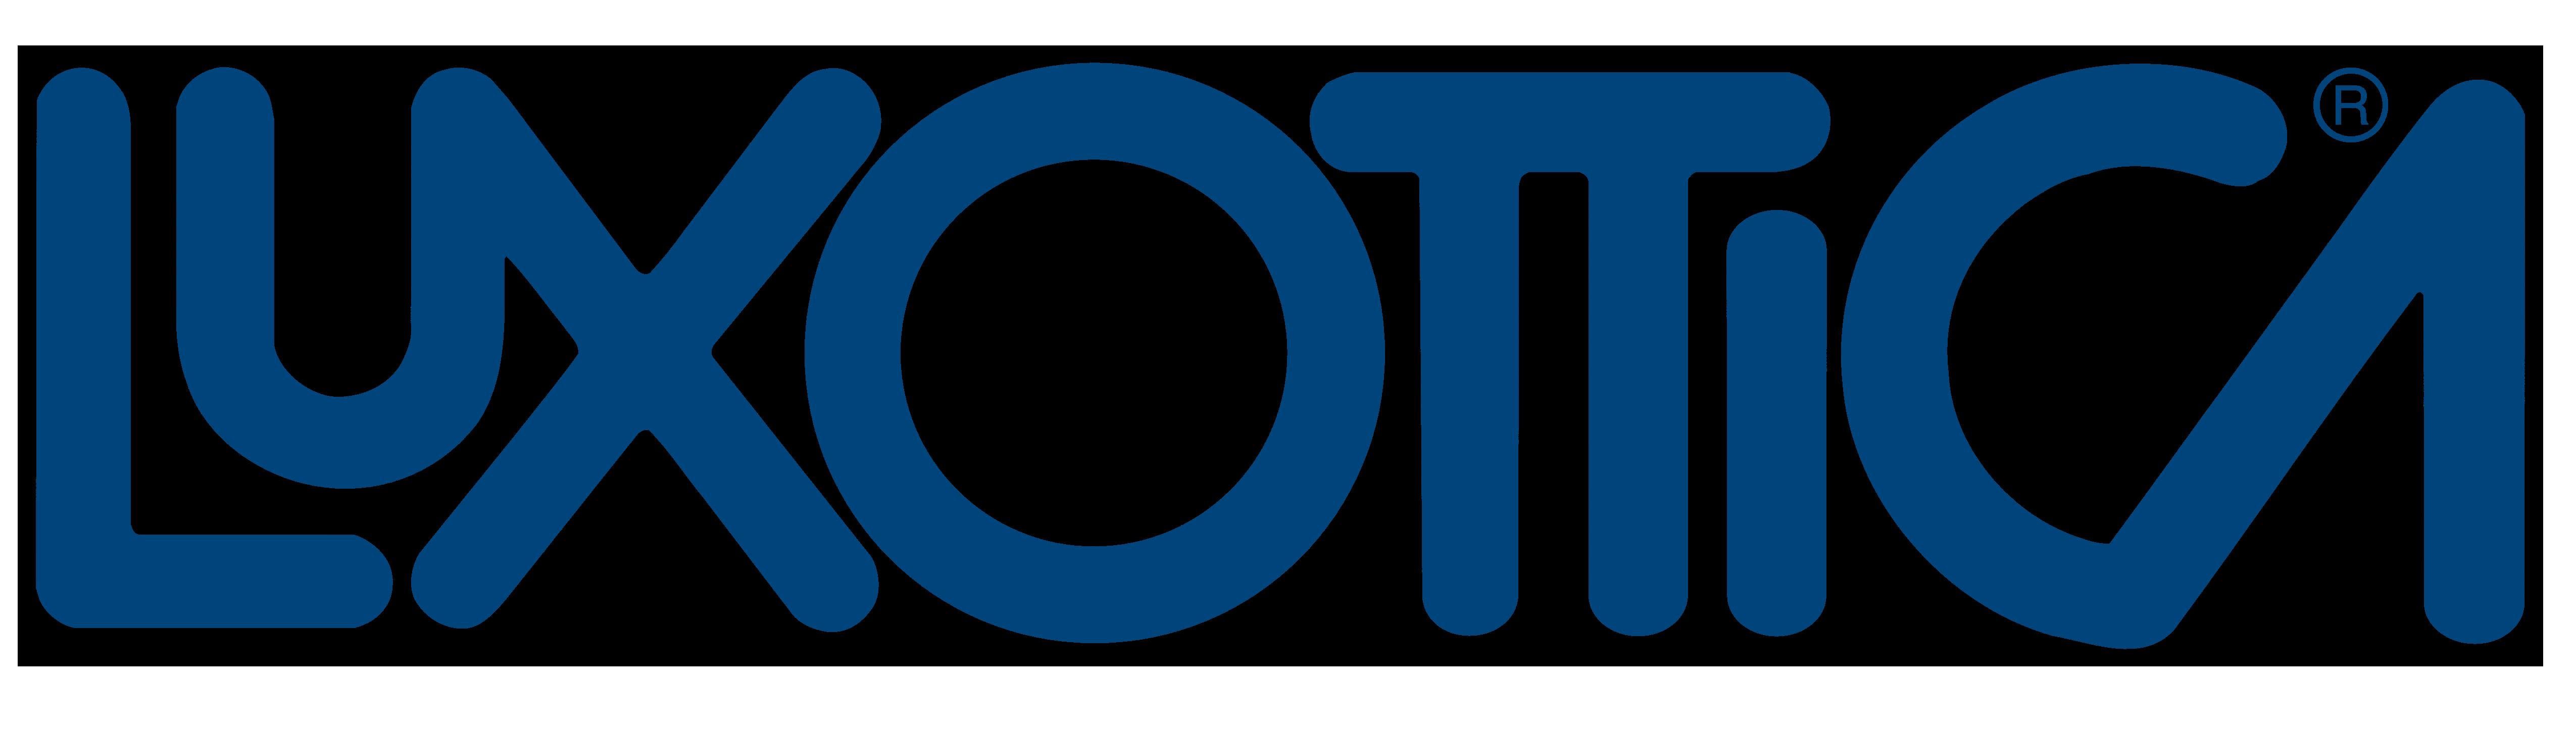 Luxottica_logo_logotype